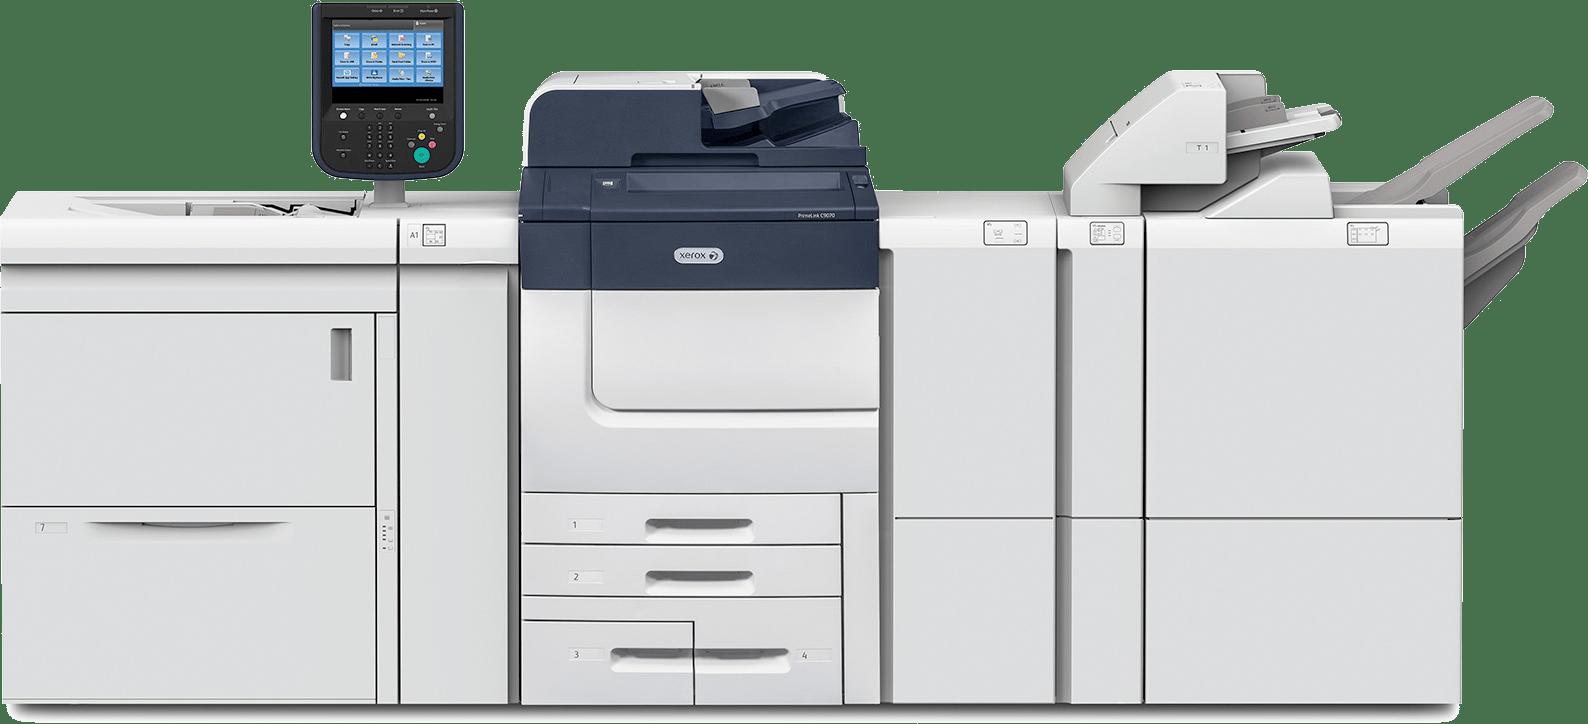 Xerox PrimeLink C9065/9070